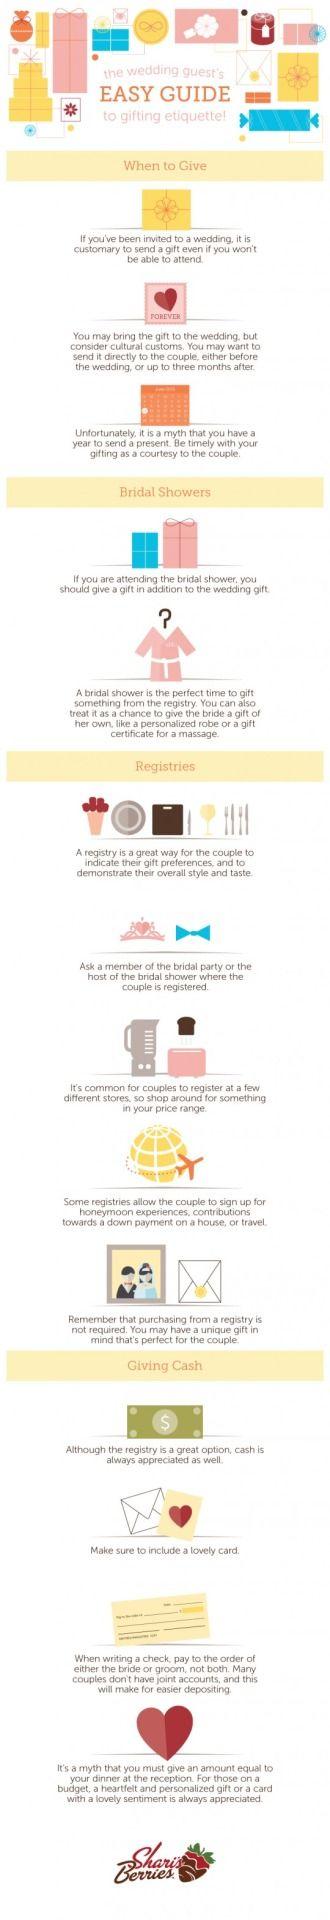 (via Wedding Gift Etiquette Made Easy)